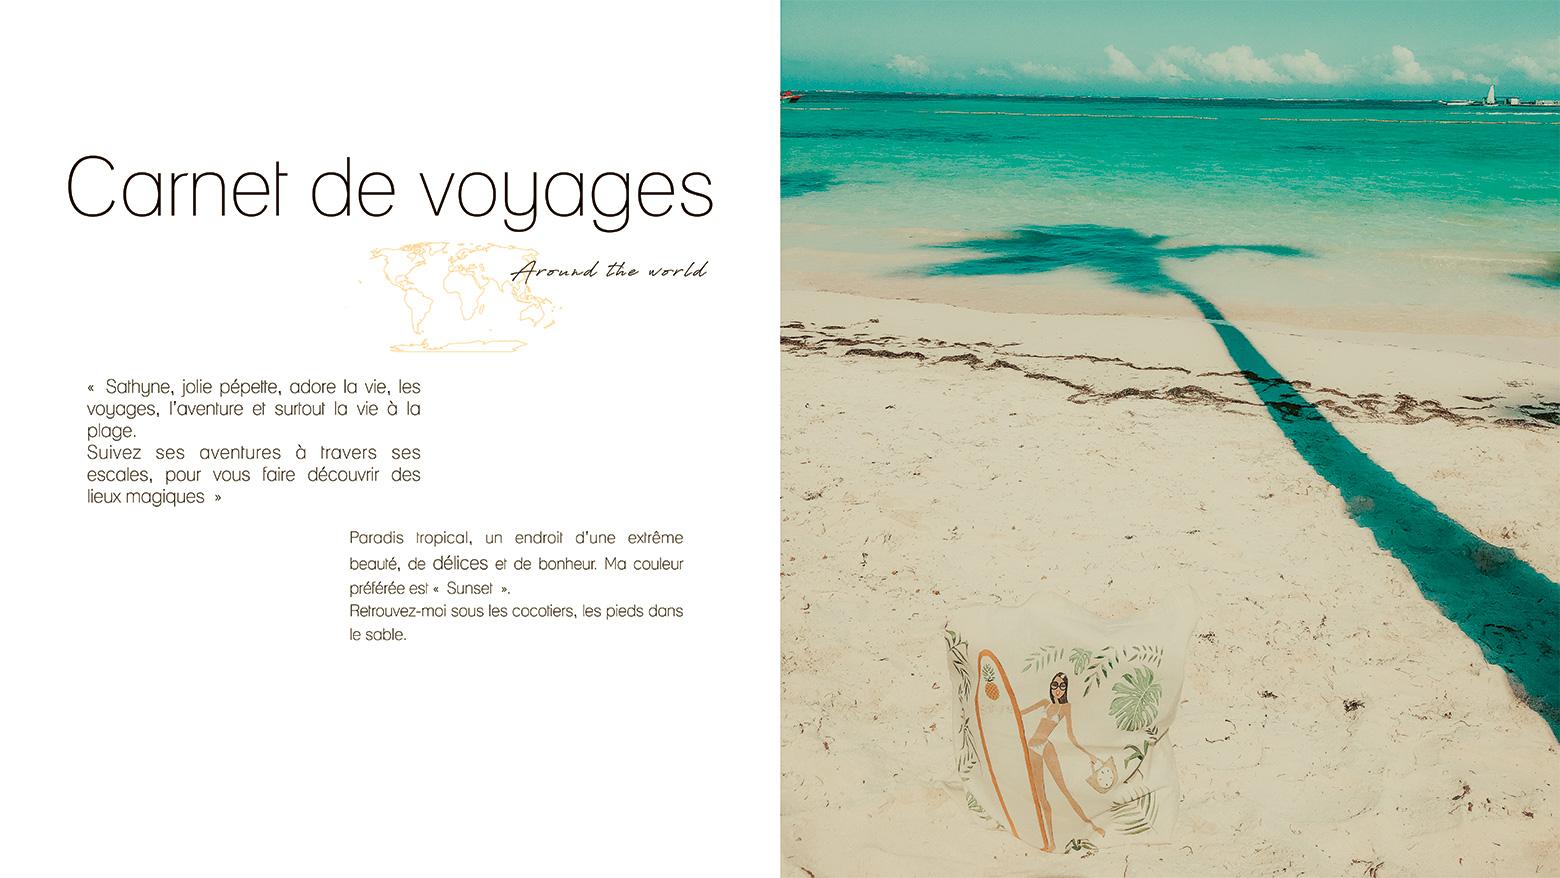 carnet-de-voyage